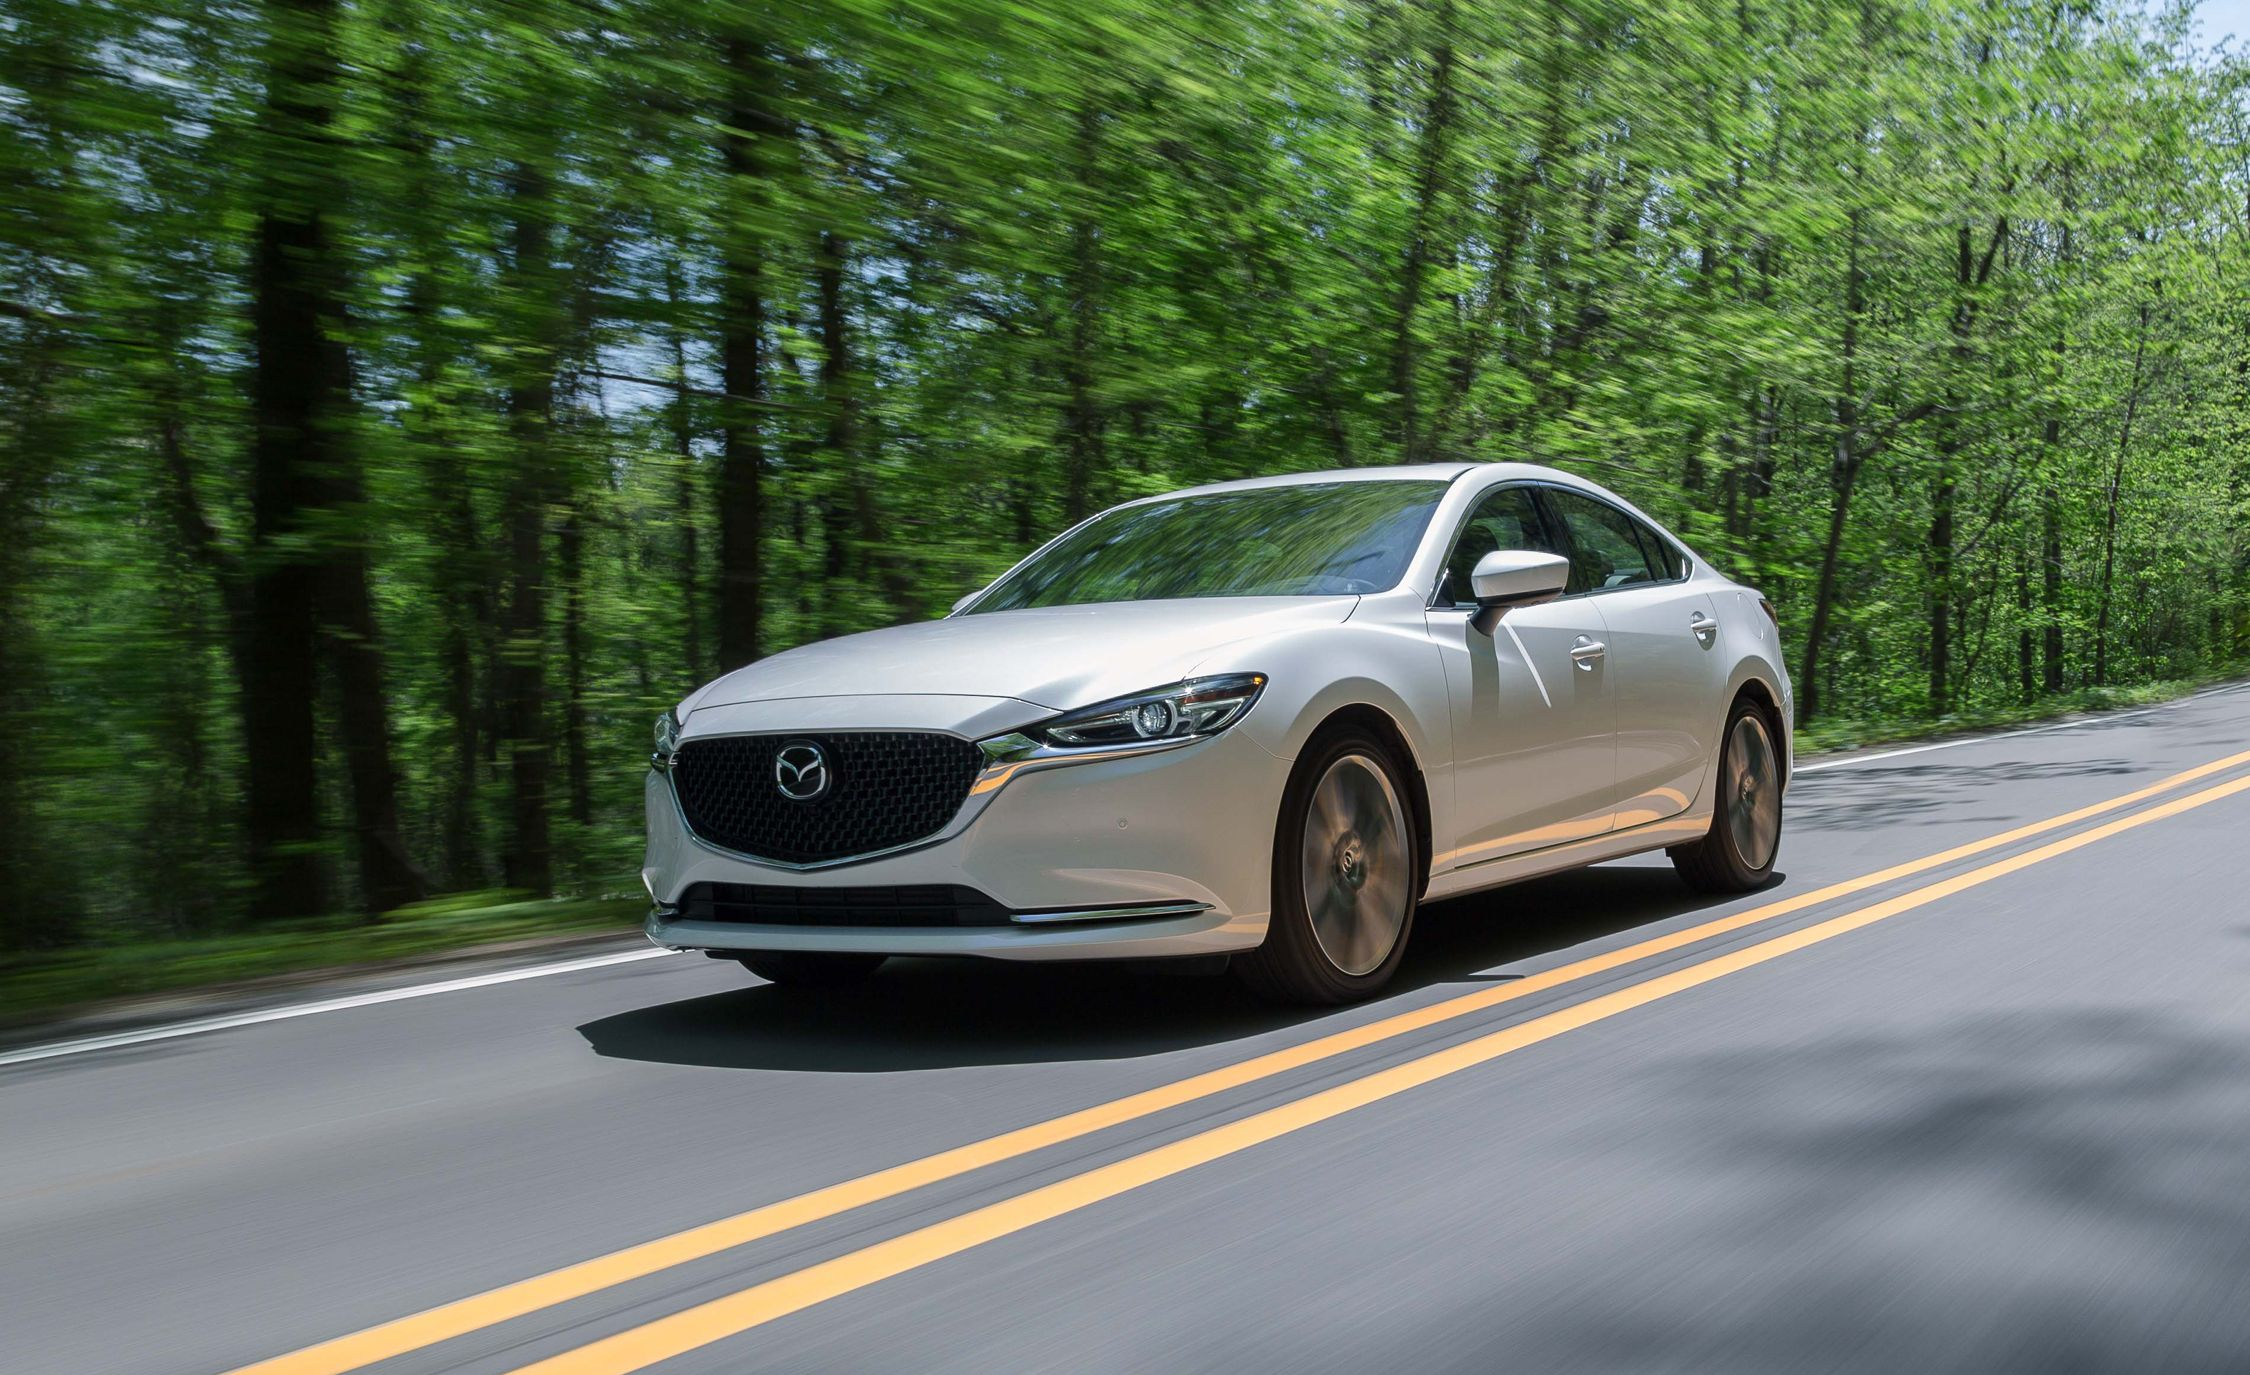 2019 Mazda 6 Reviews Price Photos And Specs 06 Chrysler 300 Fuse Box Location Illumination Car Driver